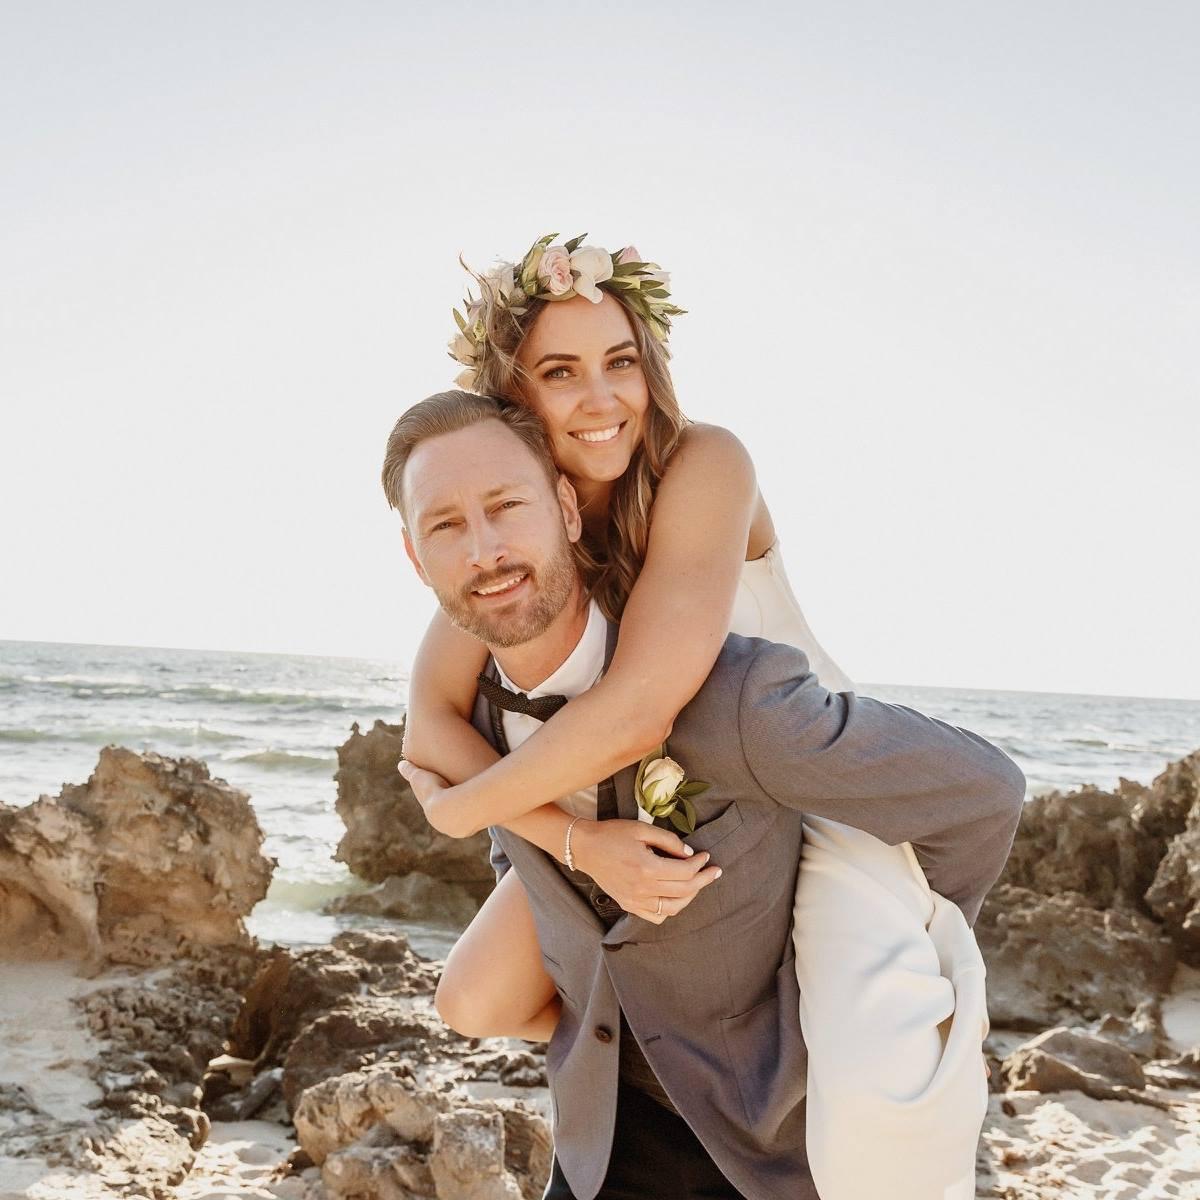 Sophie & Lee's Wedding, North Beach, Perth, AU